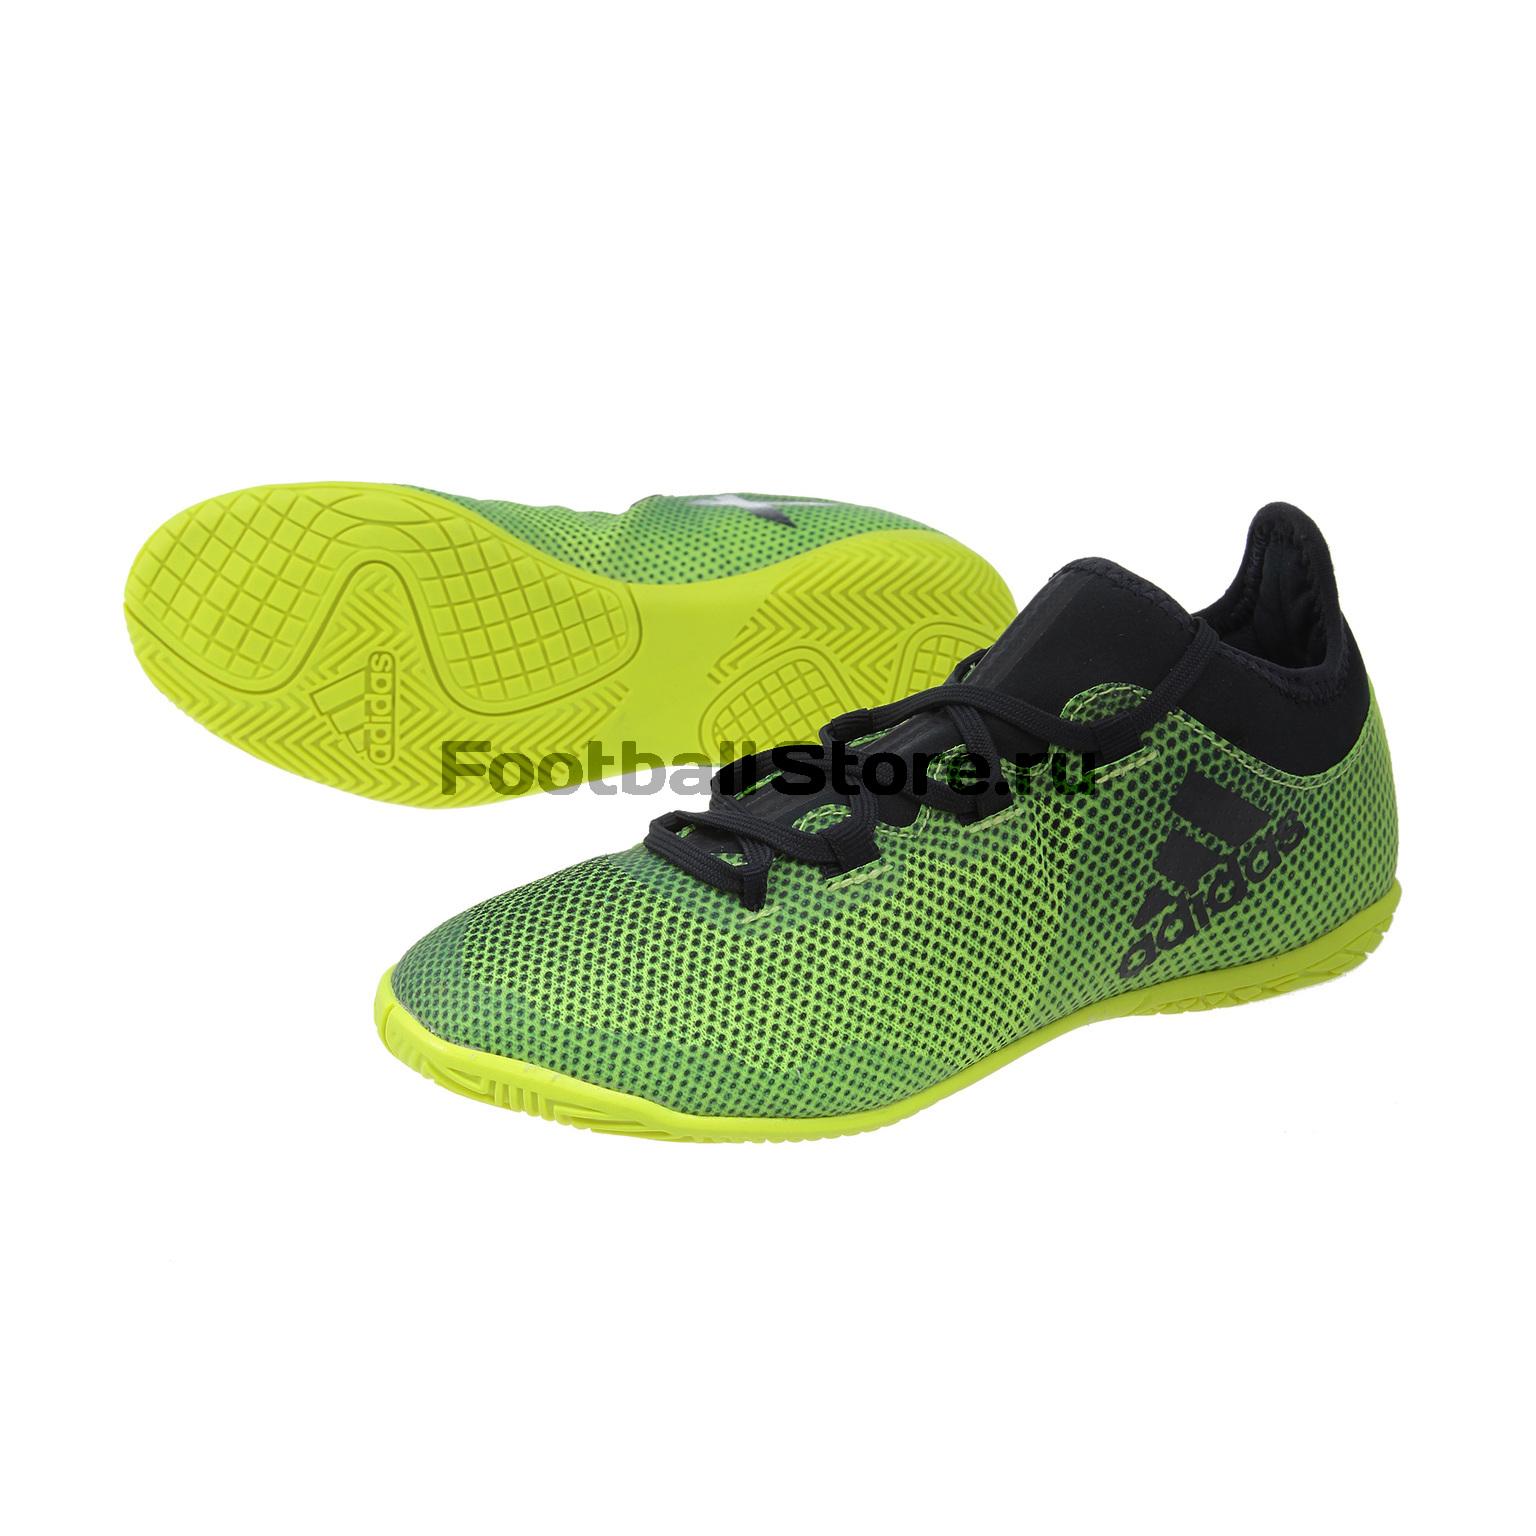 Обувь для зала Adidas X Tango 17.3 IN JR CG3723 обувь для зала adidas ace tango 18 3 in jr cp9075